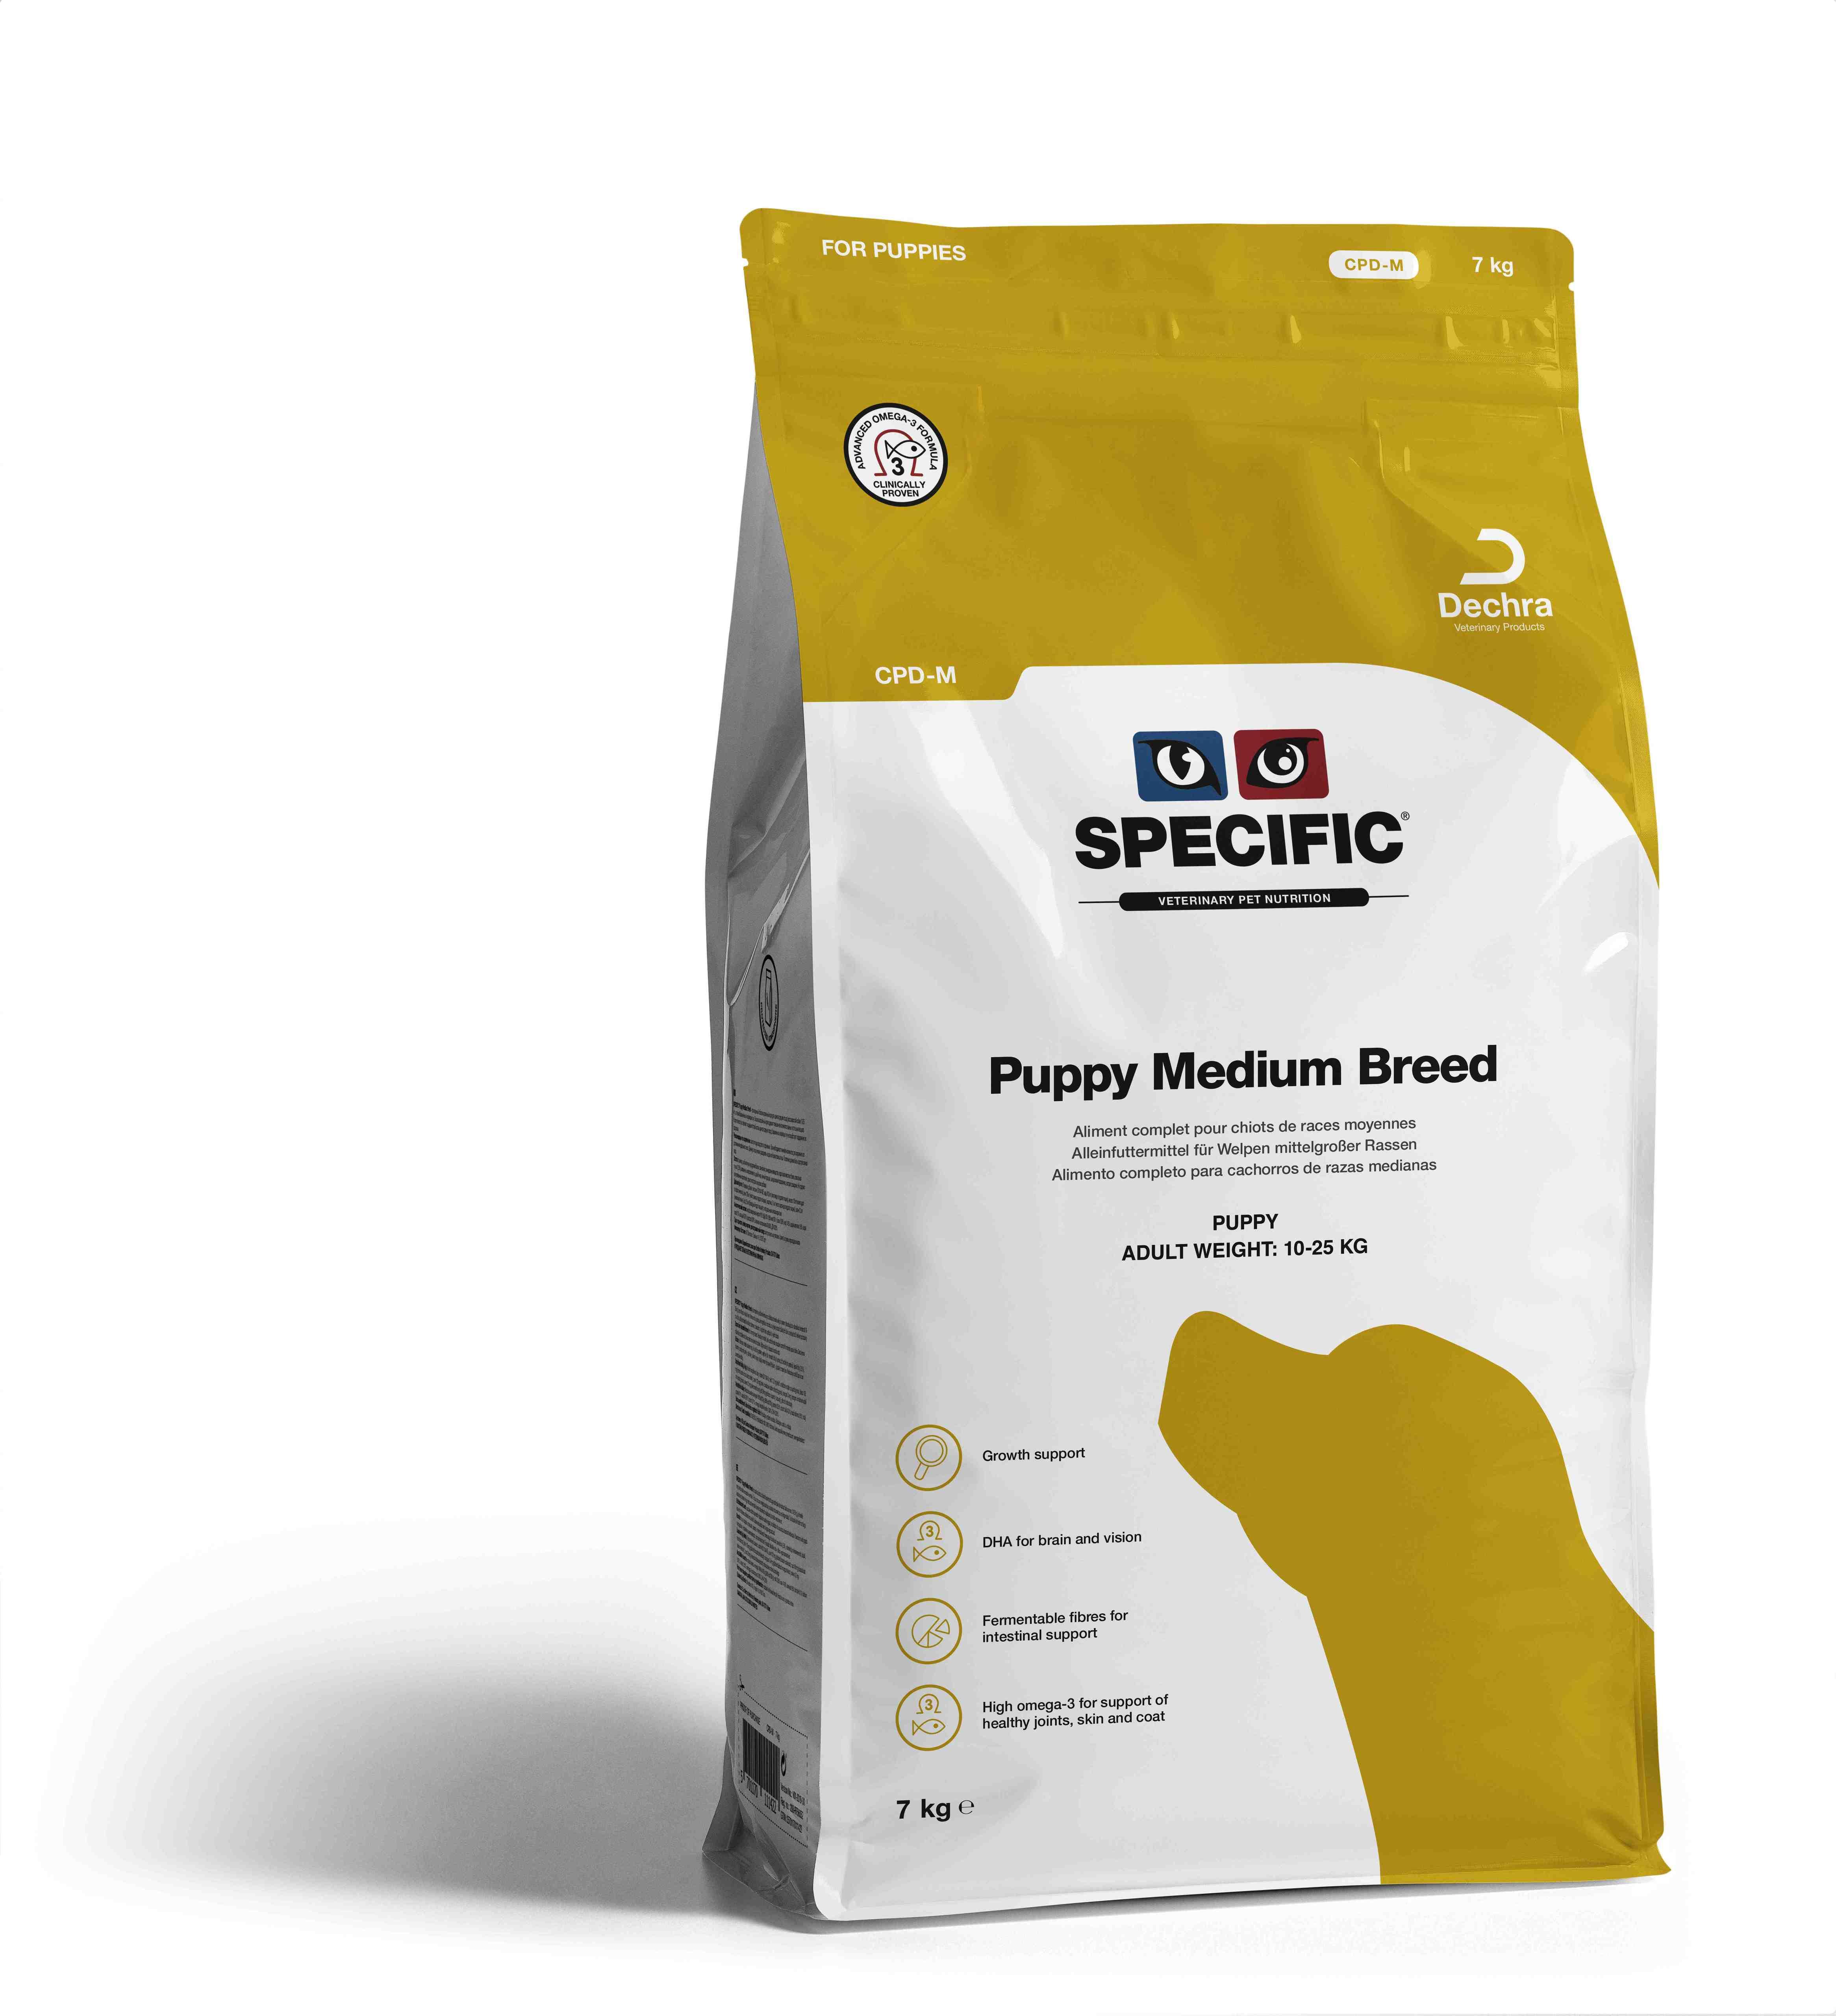 Puppy Medium Breed CPD-M - 7 kg